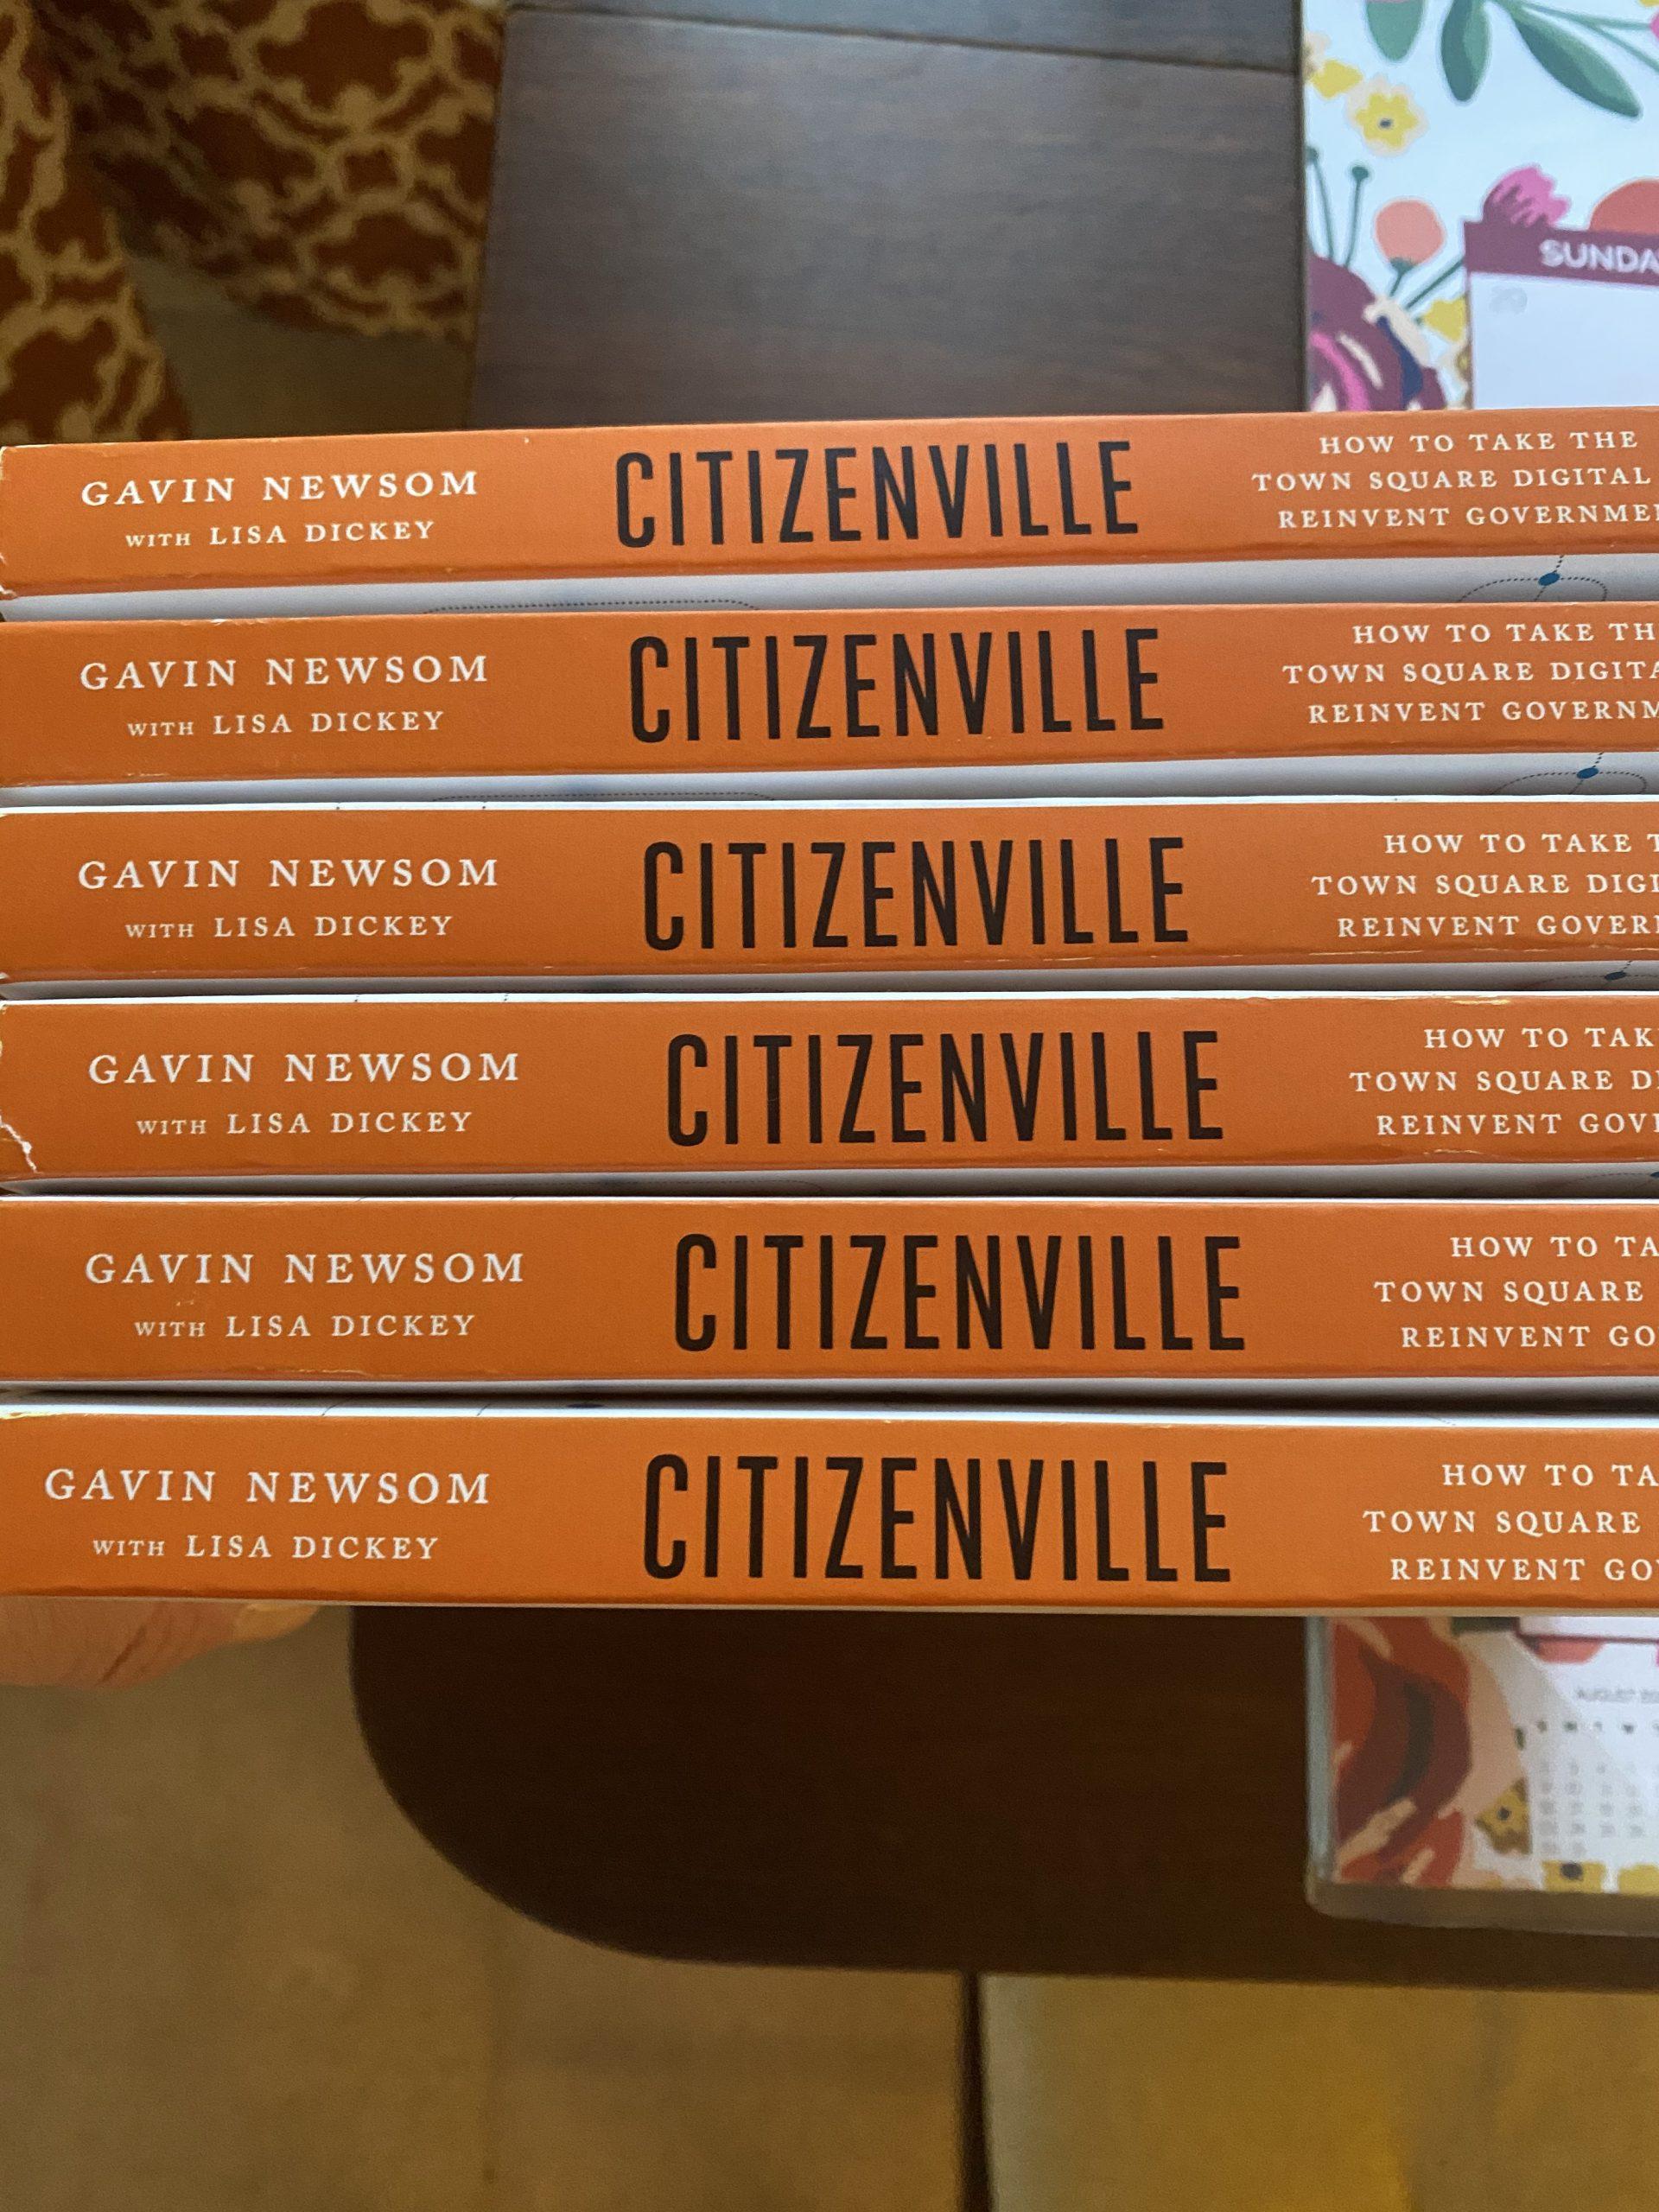 Citizenville